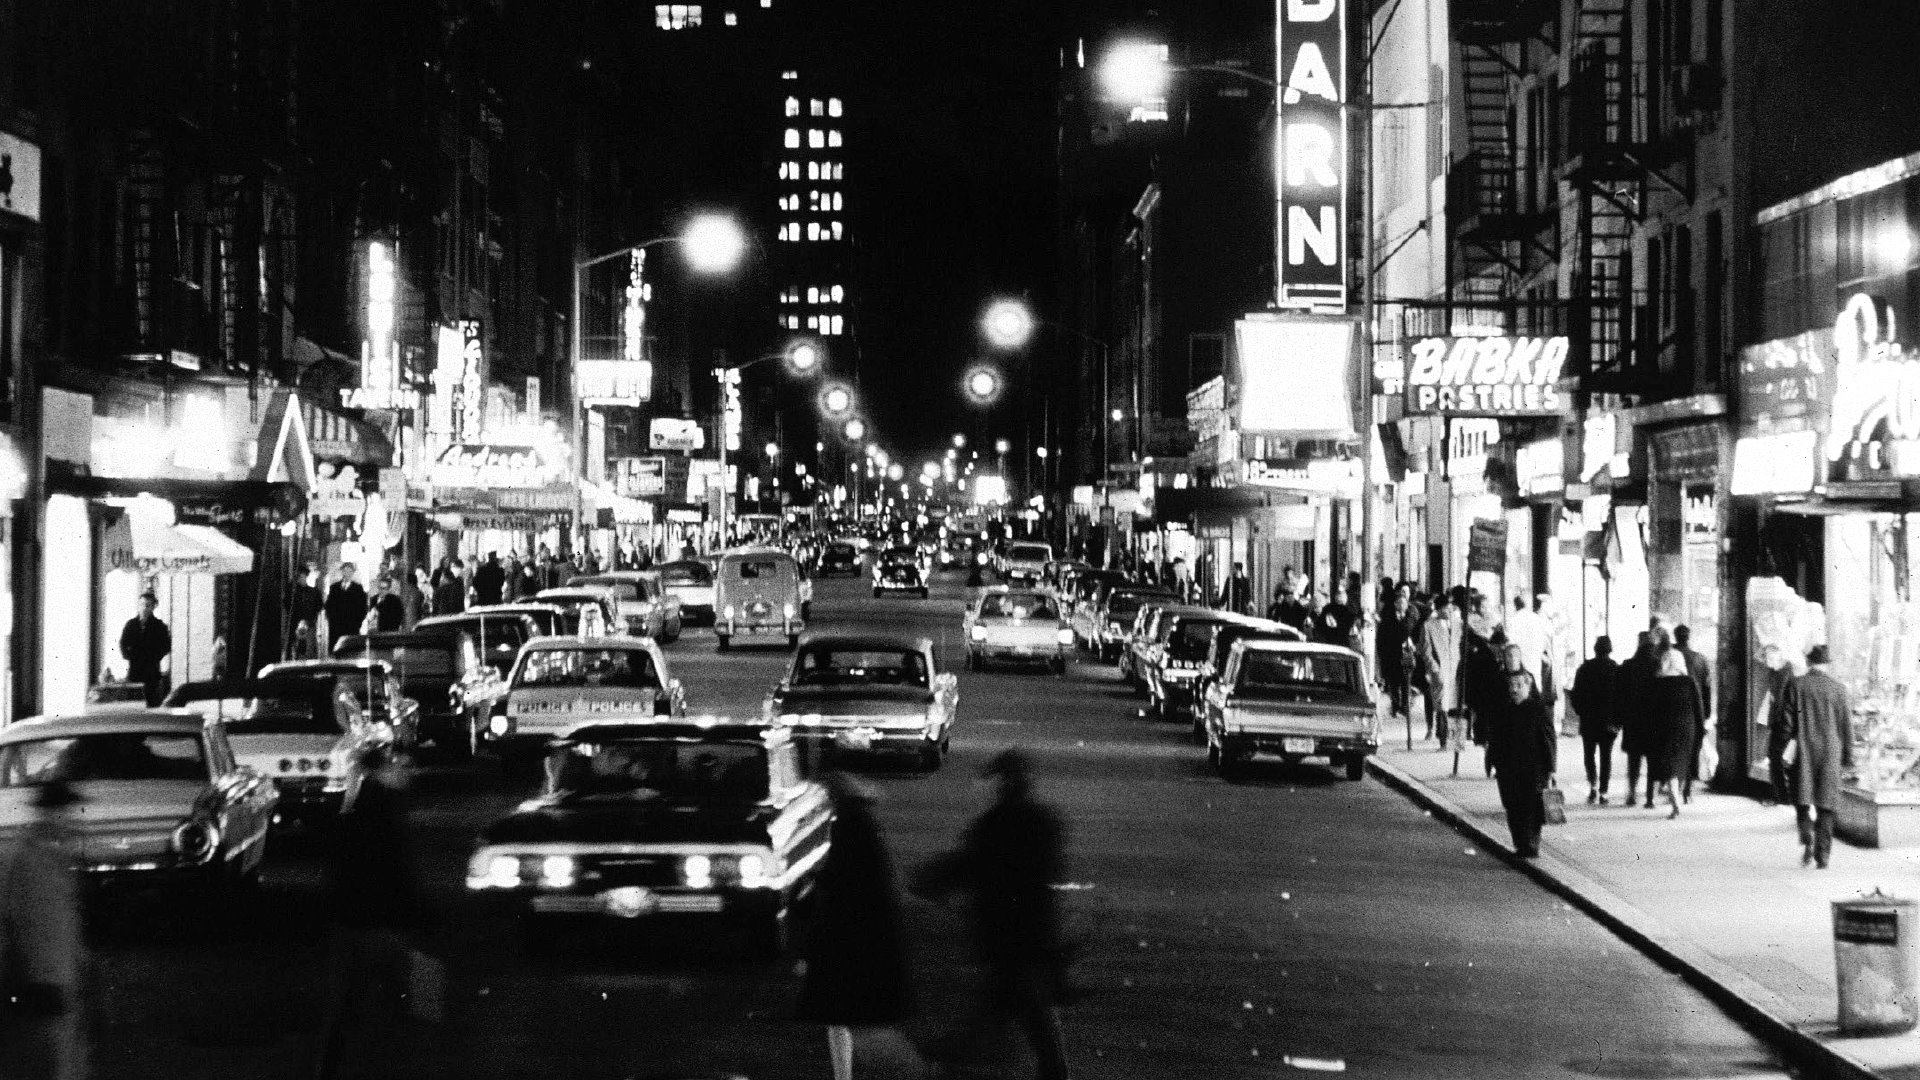 Nueva York 1945-1968: Pollock, Jacobs, Dylan